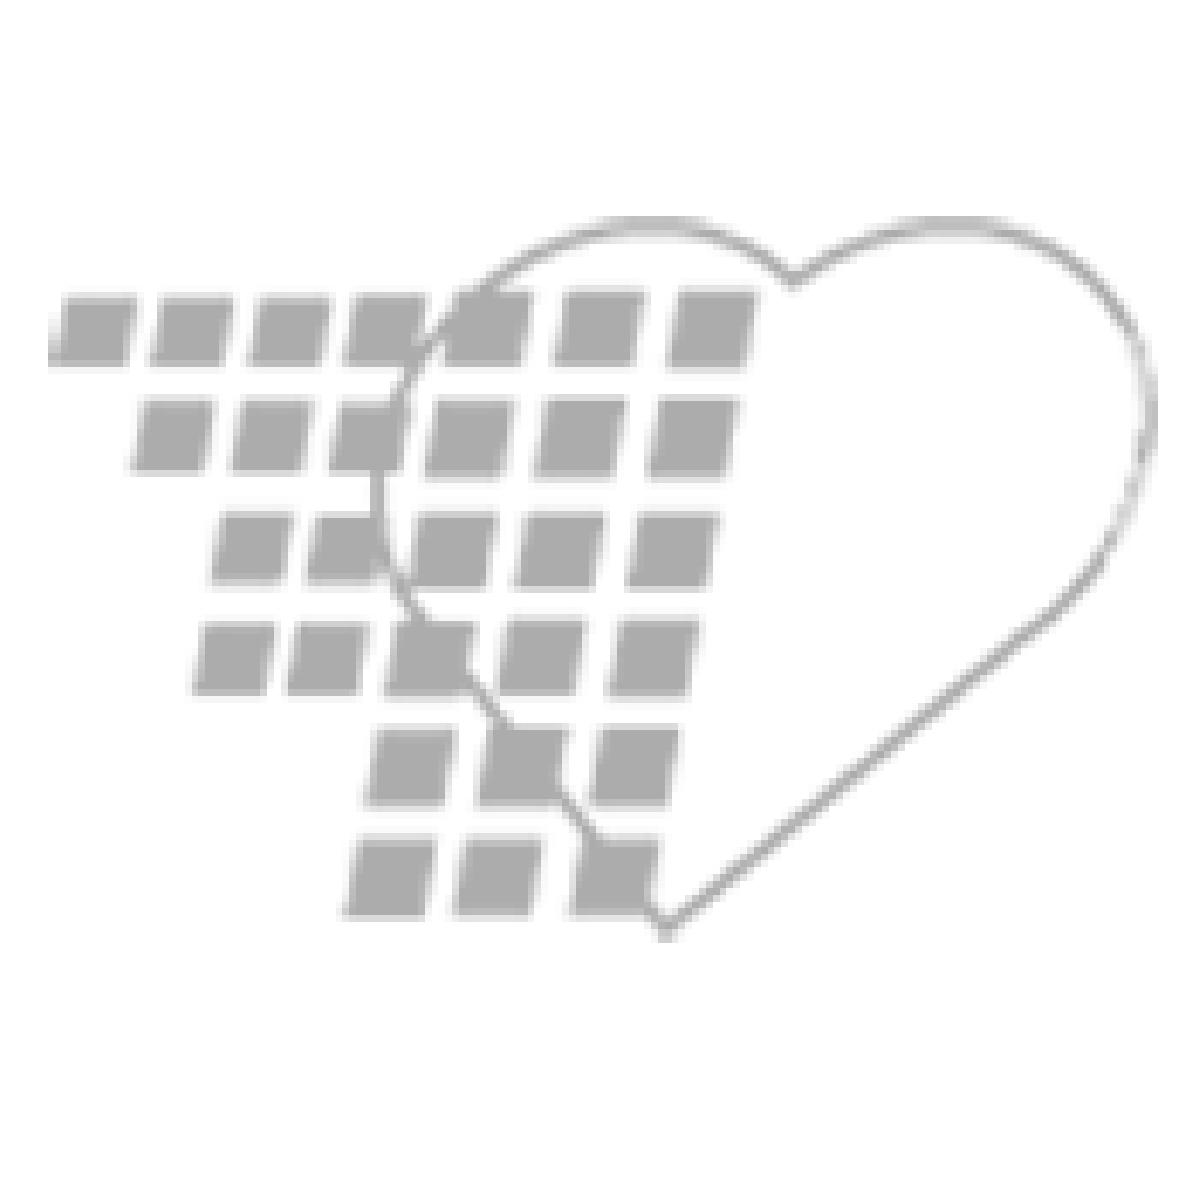 05-59-6240 - Argyle   Sterile Saline 0.9% - 100 mL